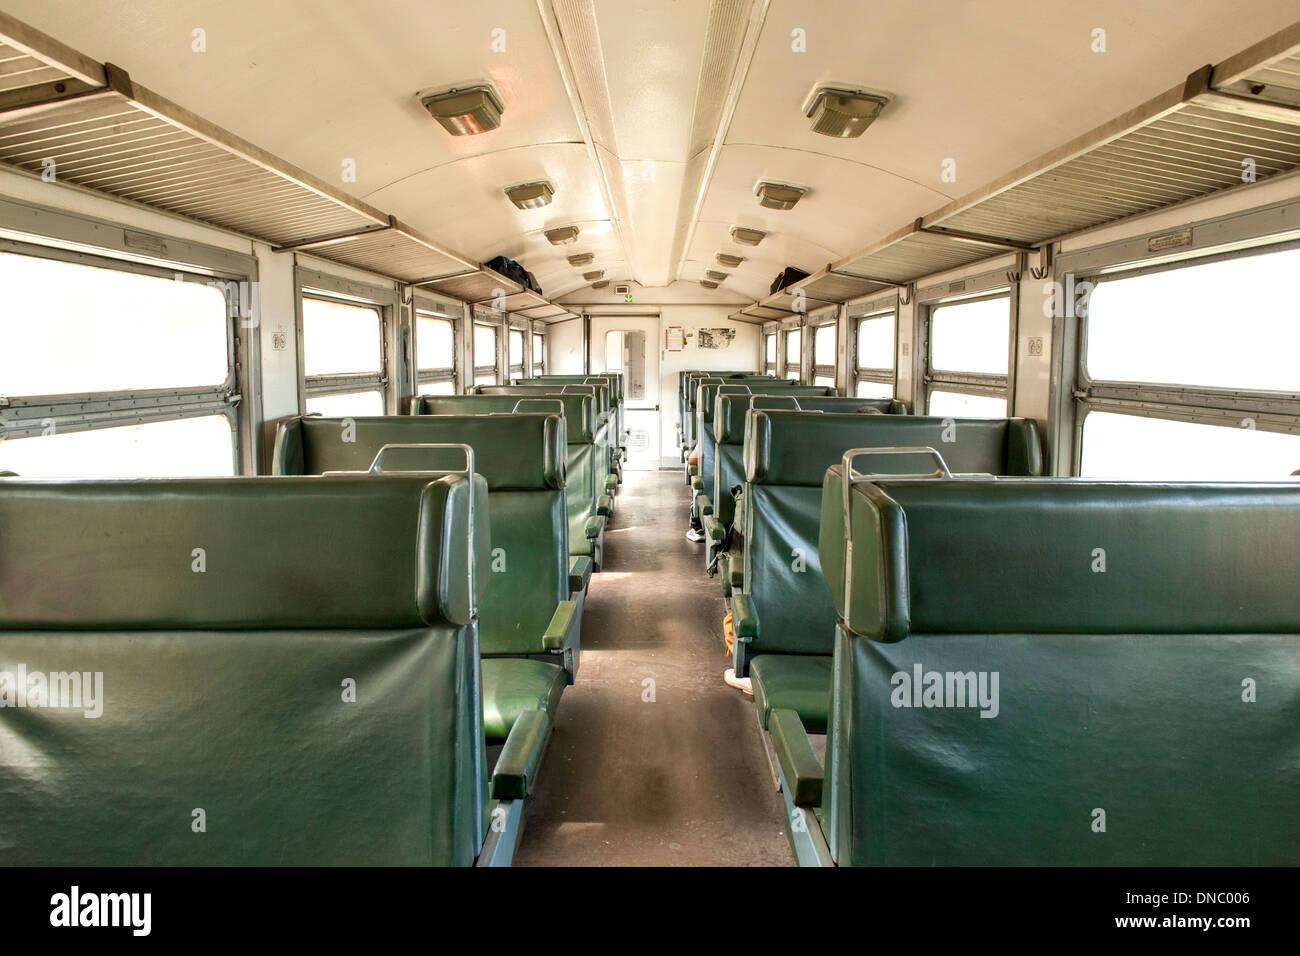 Interior of a Bulgarian inter-city train. - Stock Image